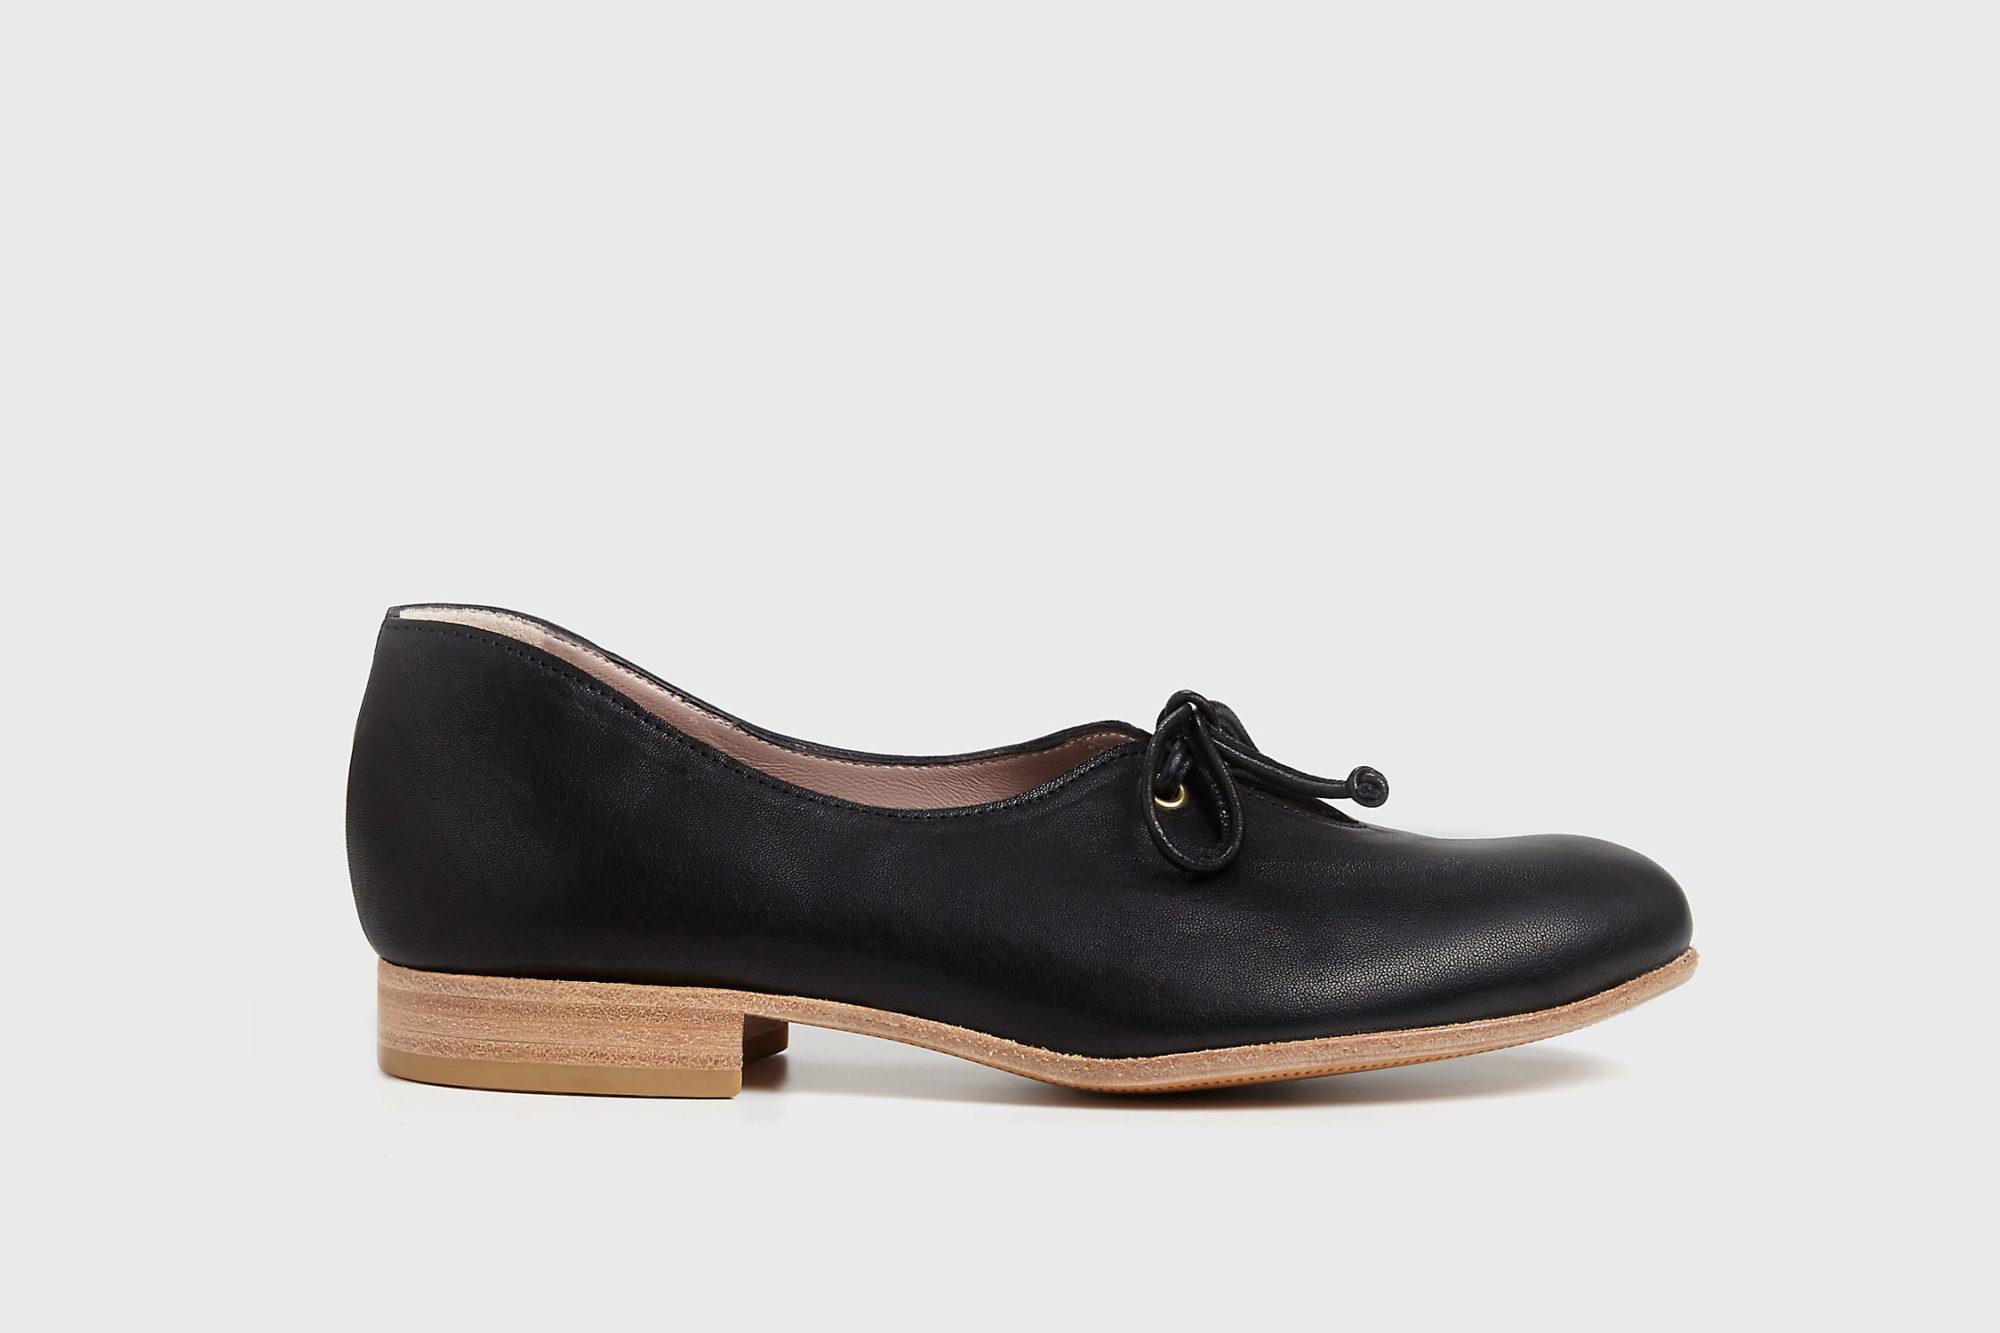 Dorotea zapato de cordones Carrie negro ss17 eprfil